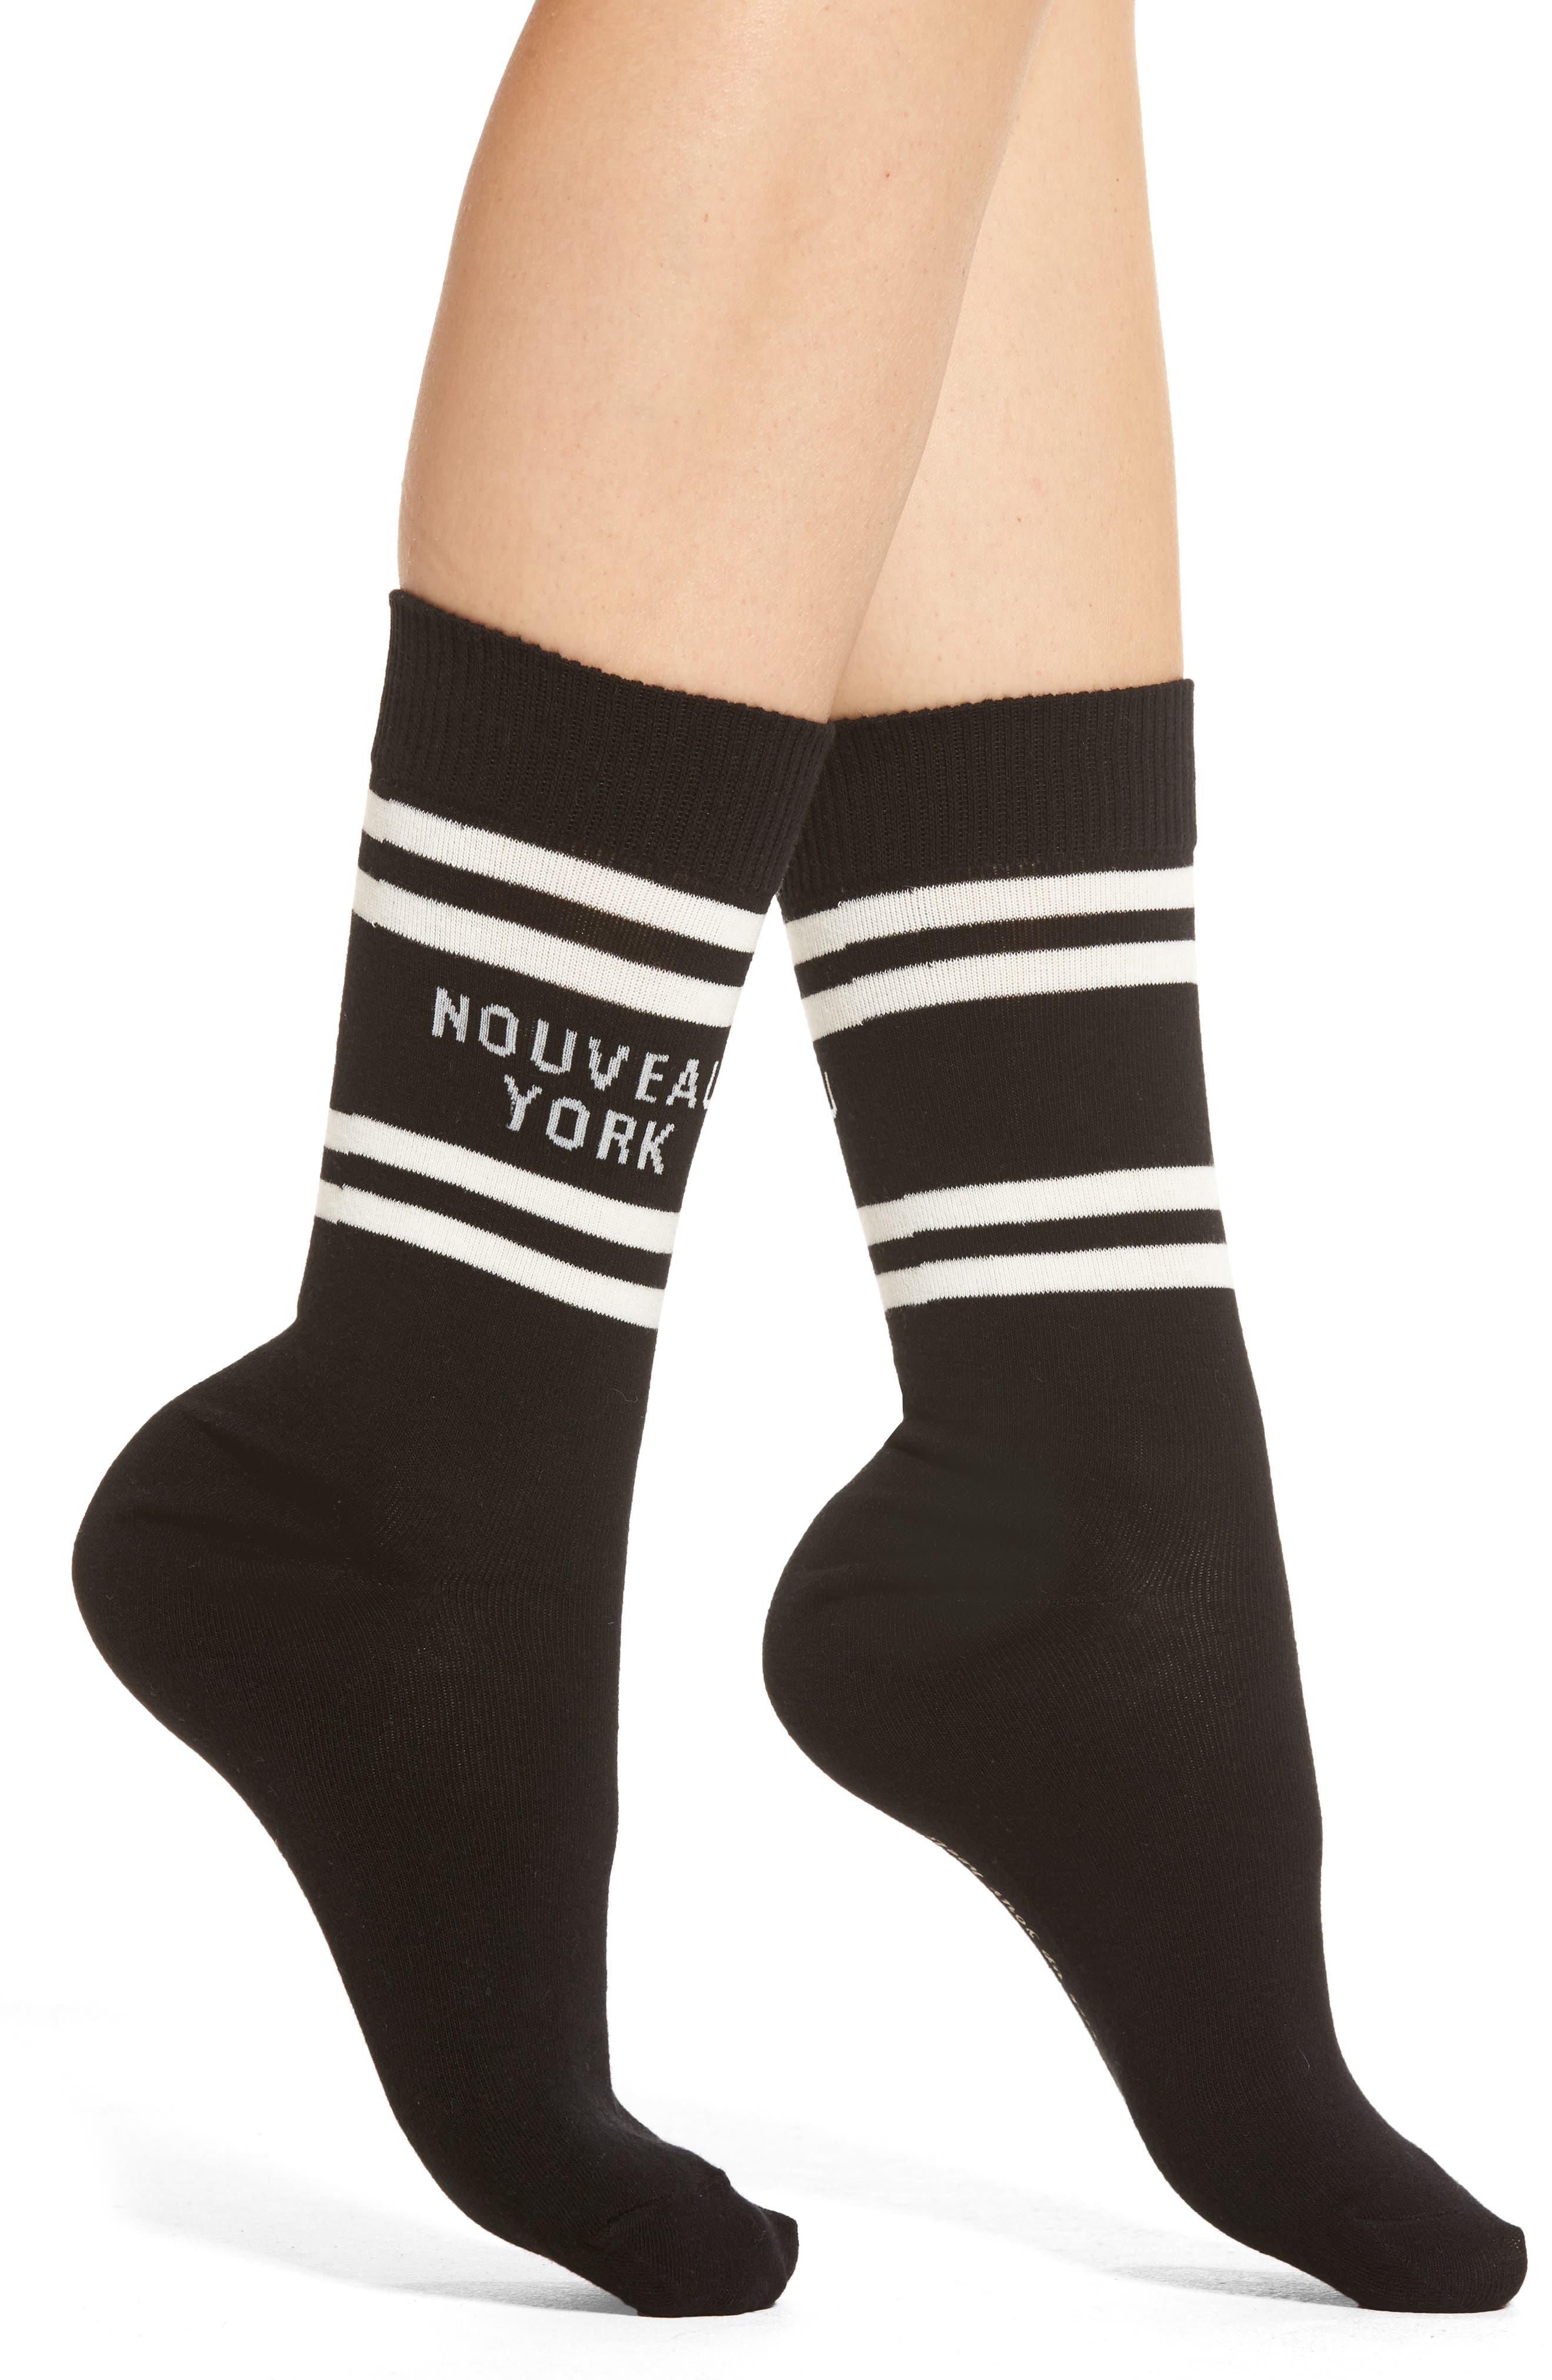 Main Image - kate spade new york nouveau york crew socks